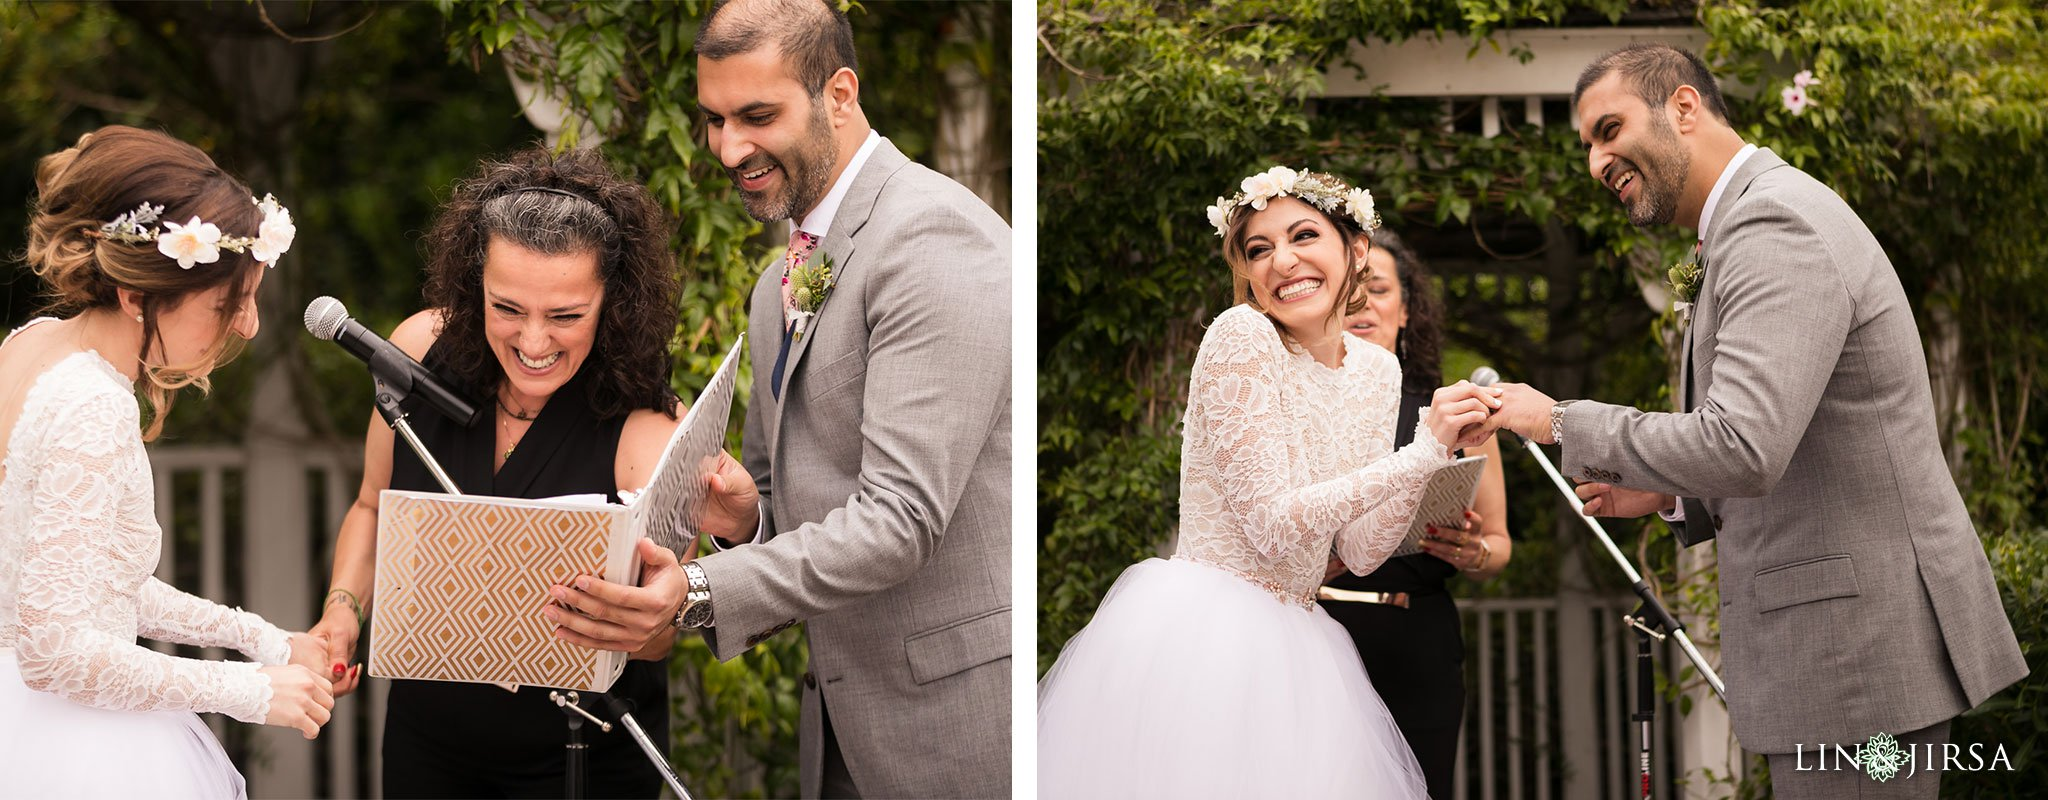 21-carmel-mountain-ranch-san-diego-pakistani-persian-muslim-wedding-ceremony-photography.jpg